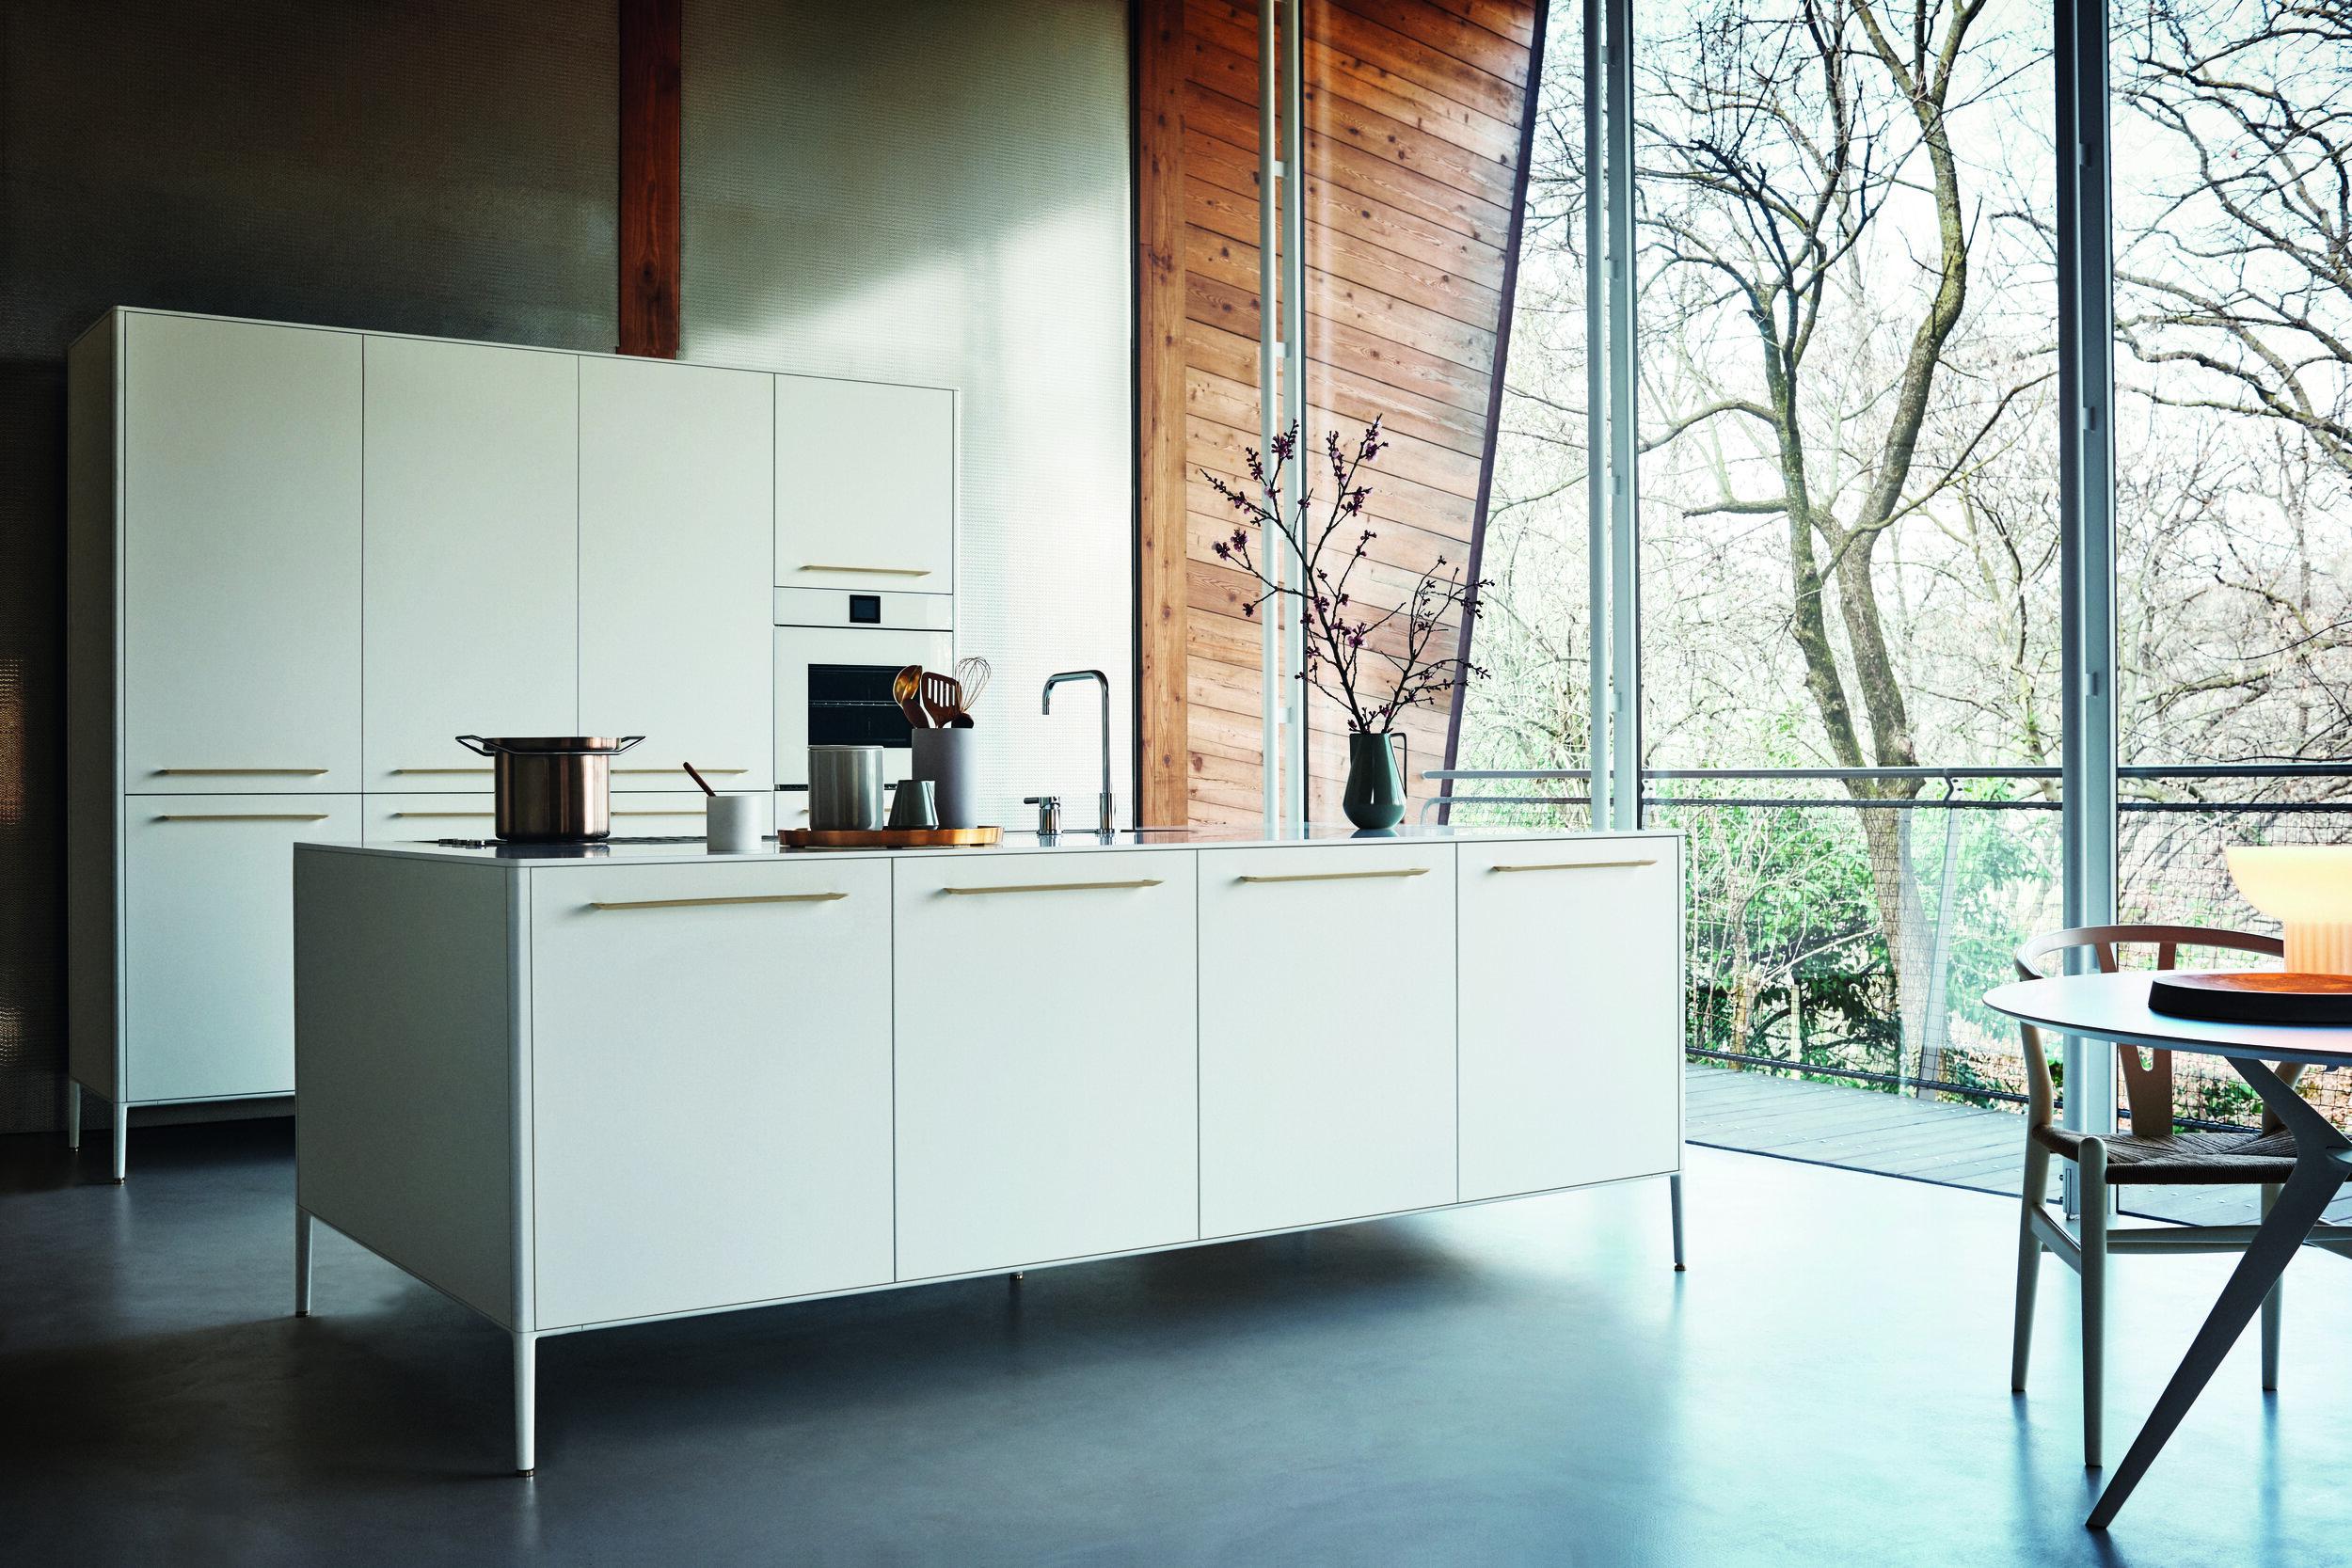 Kitchen Bath Home Design And Remodel